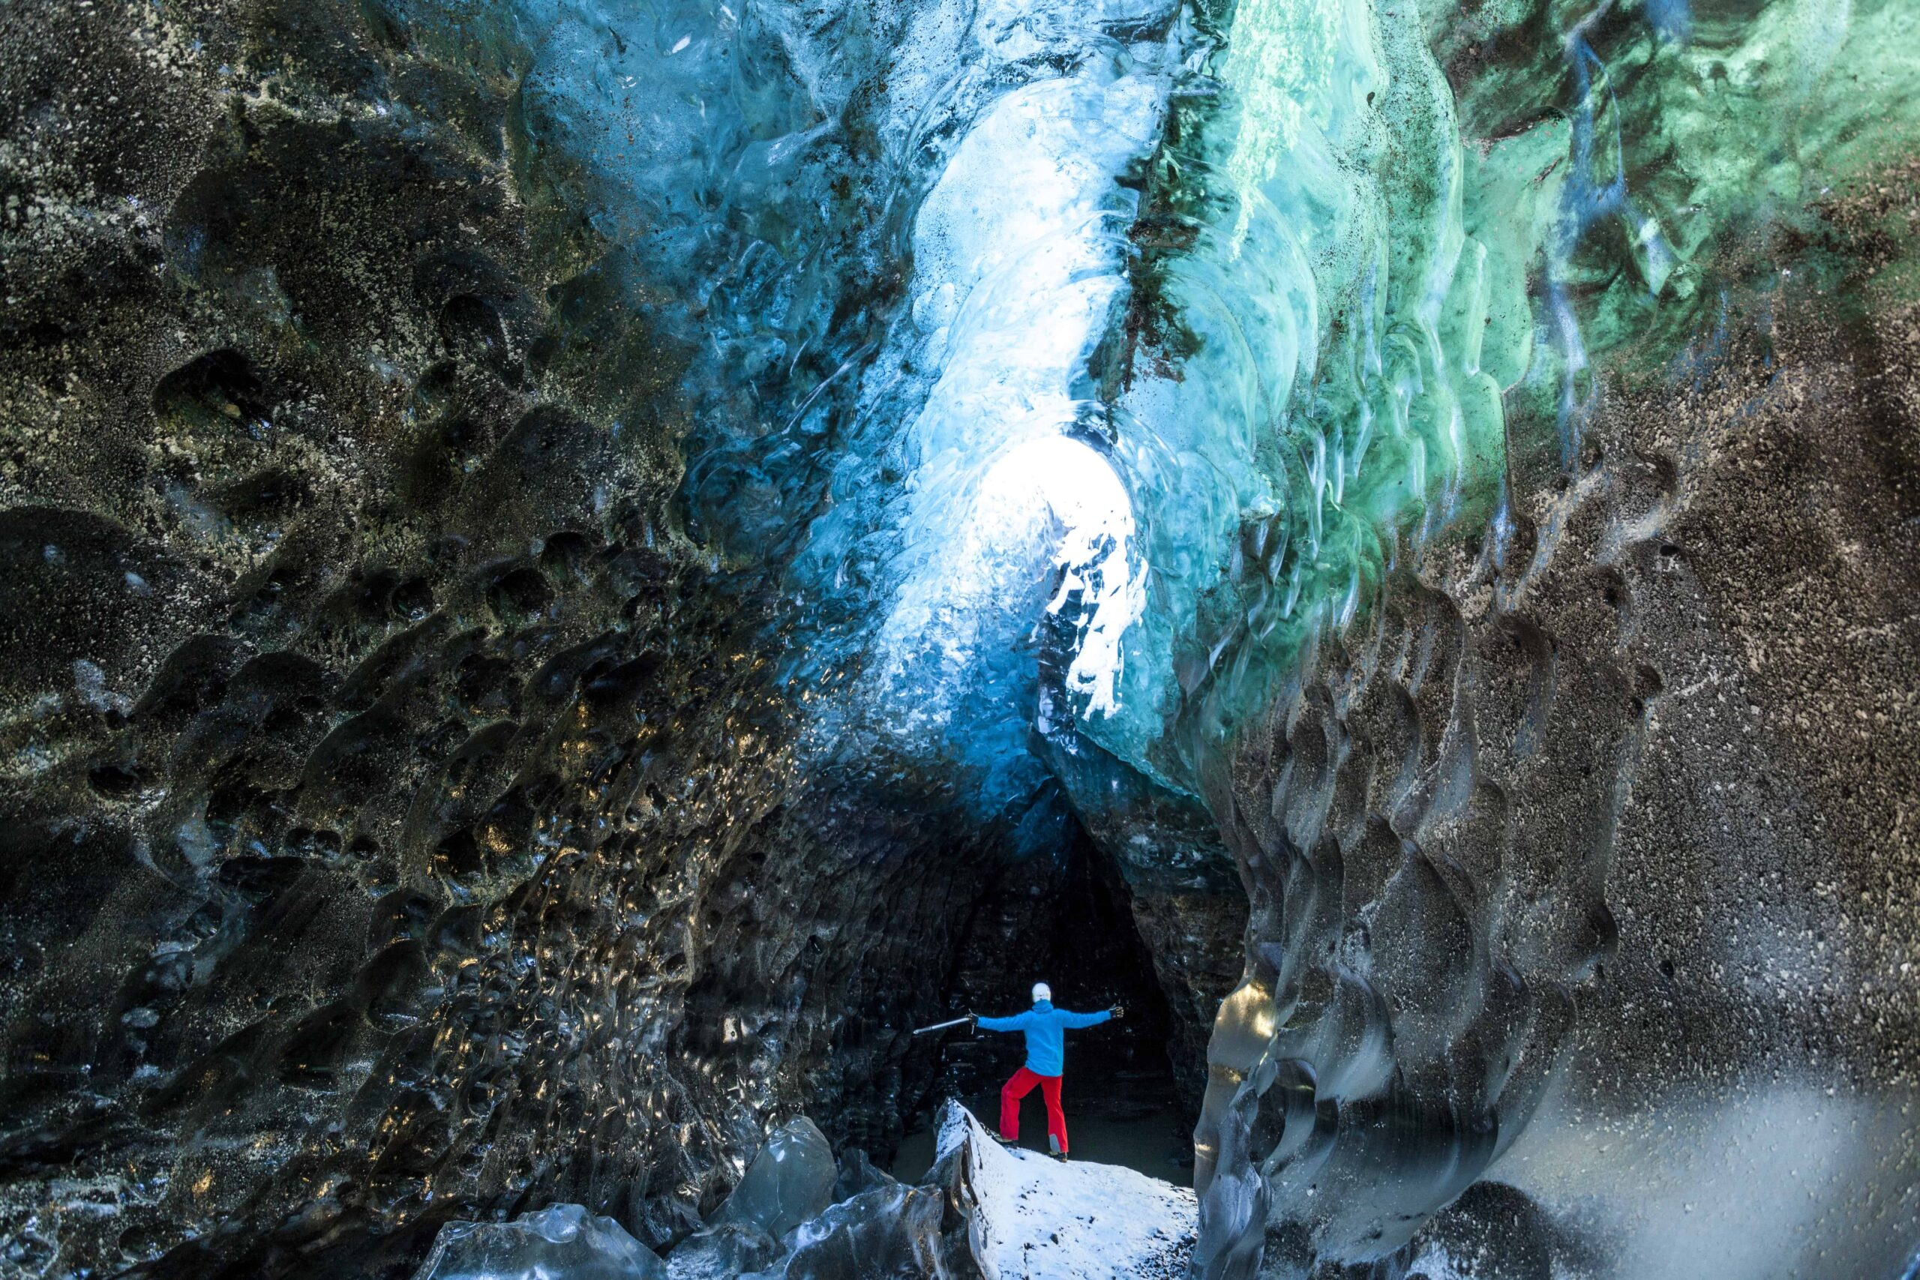 ice cave in Svínafellsjokull glacier tounge - Vatnajokull glacier - Skaftafell Nature Reserve